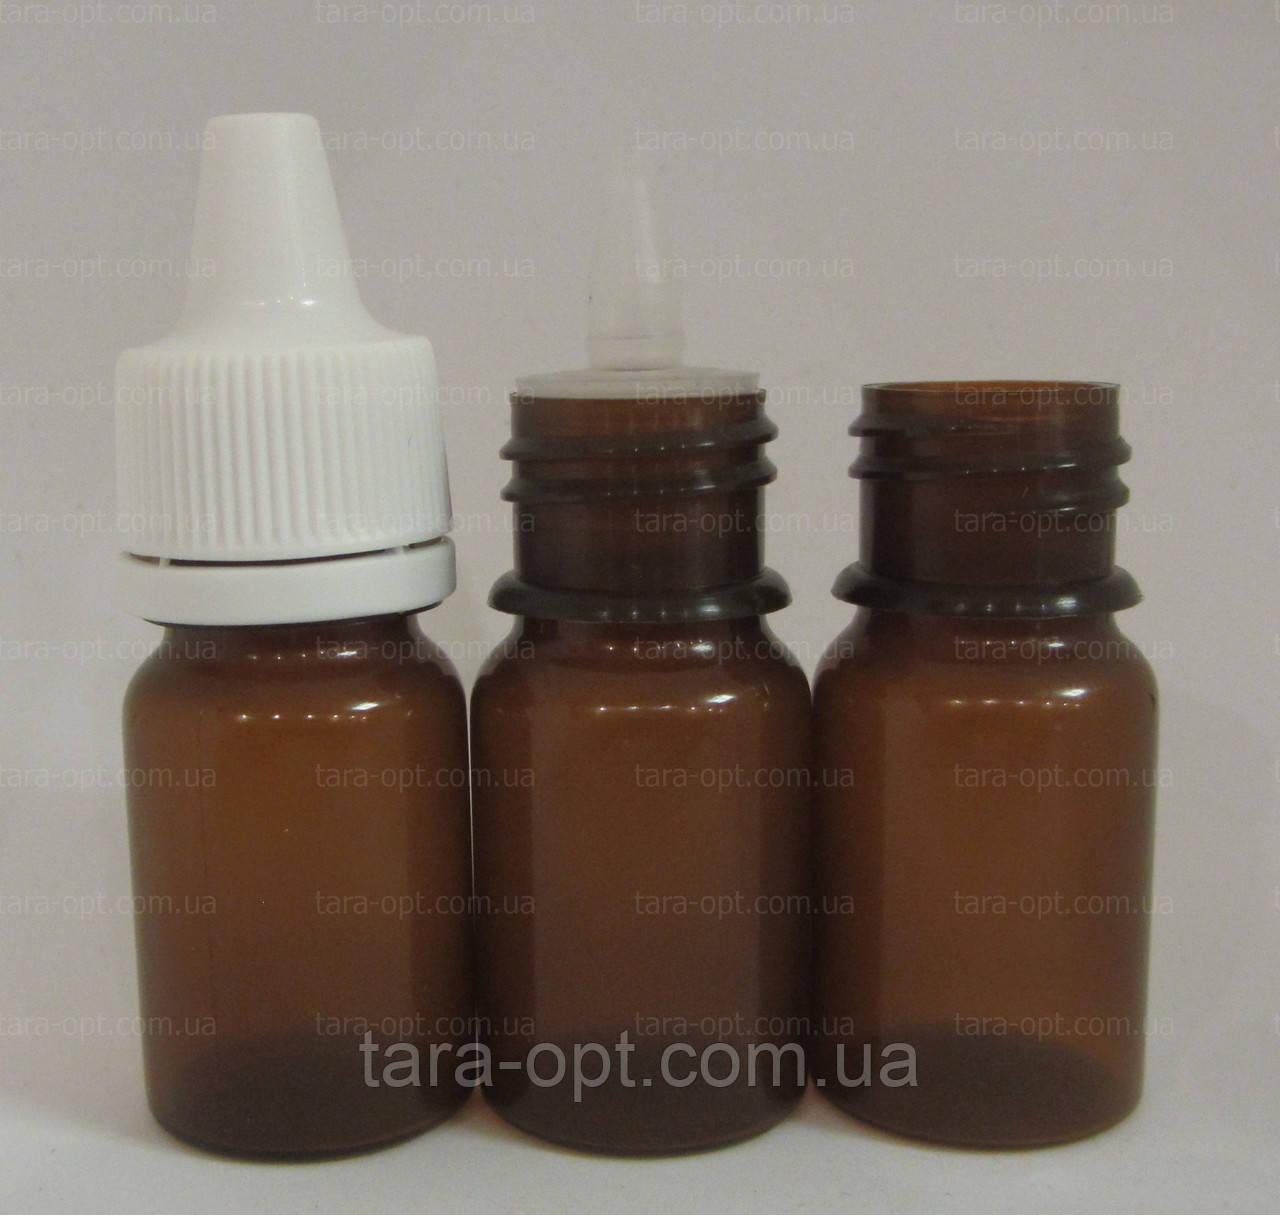 Флакон полимерный 10 мл, (Цена от 1,80 грн)*